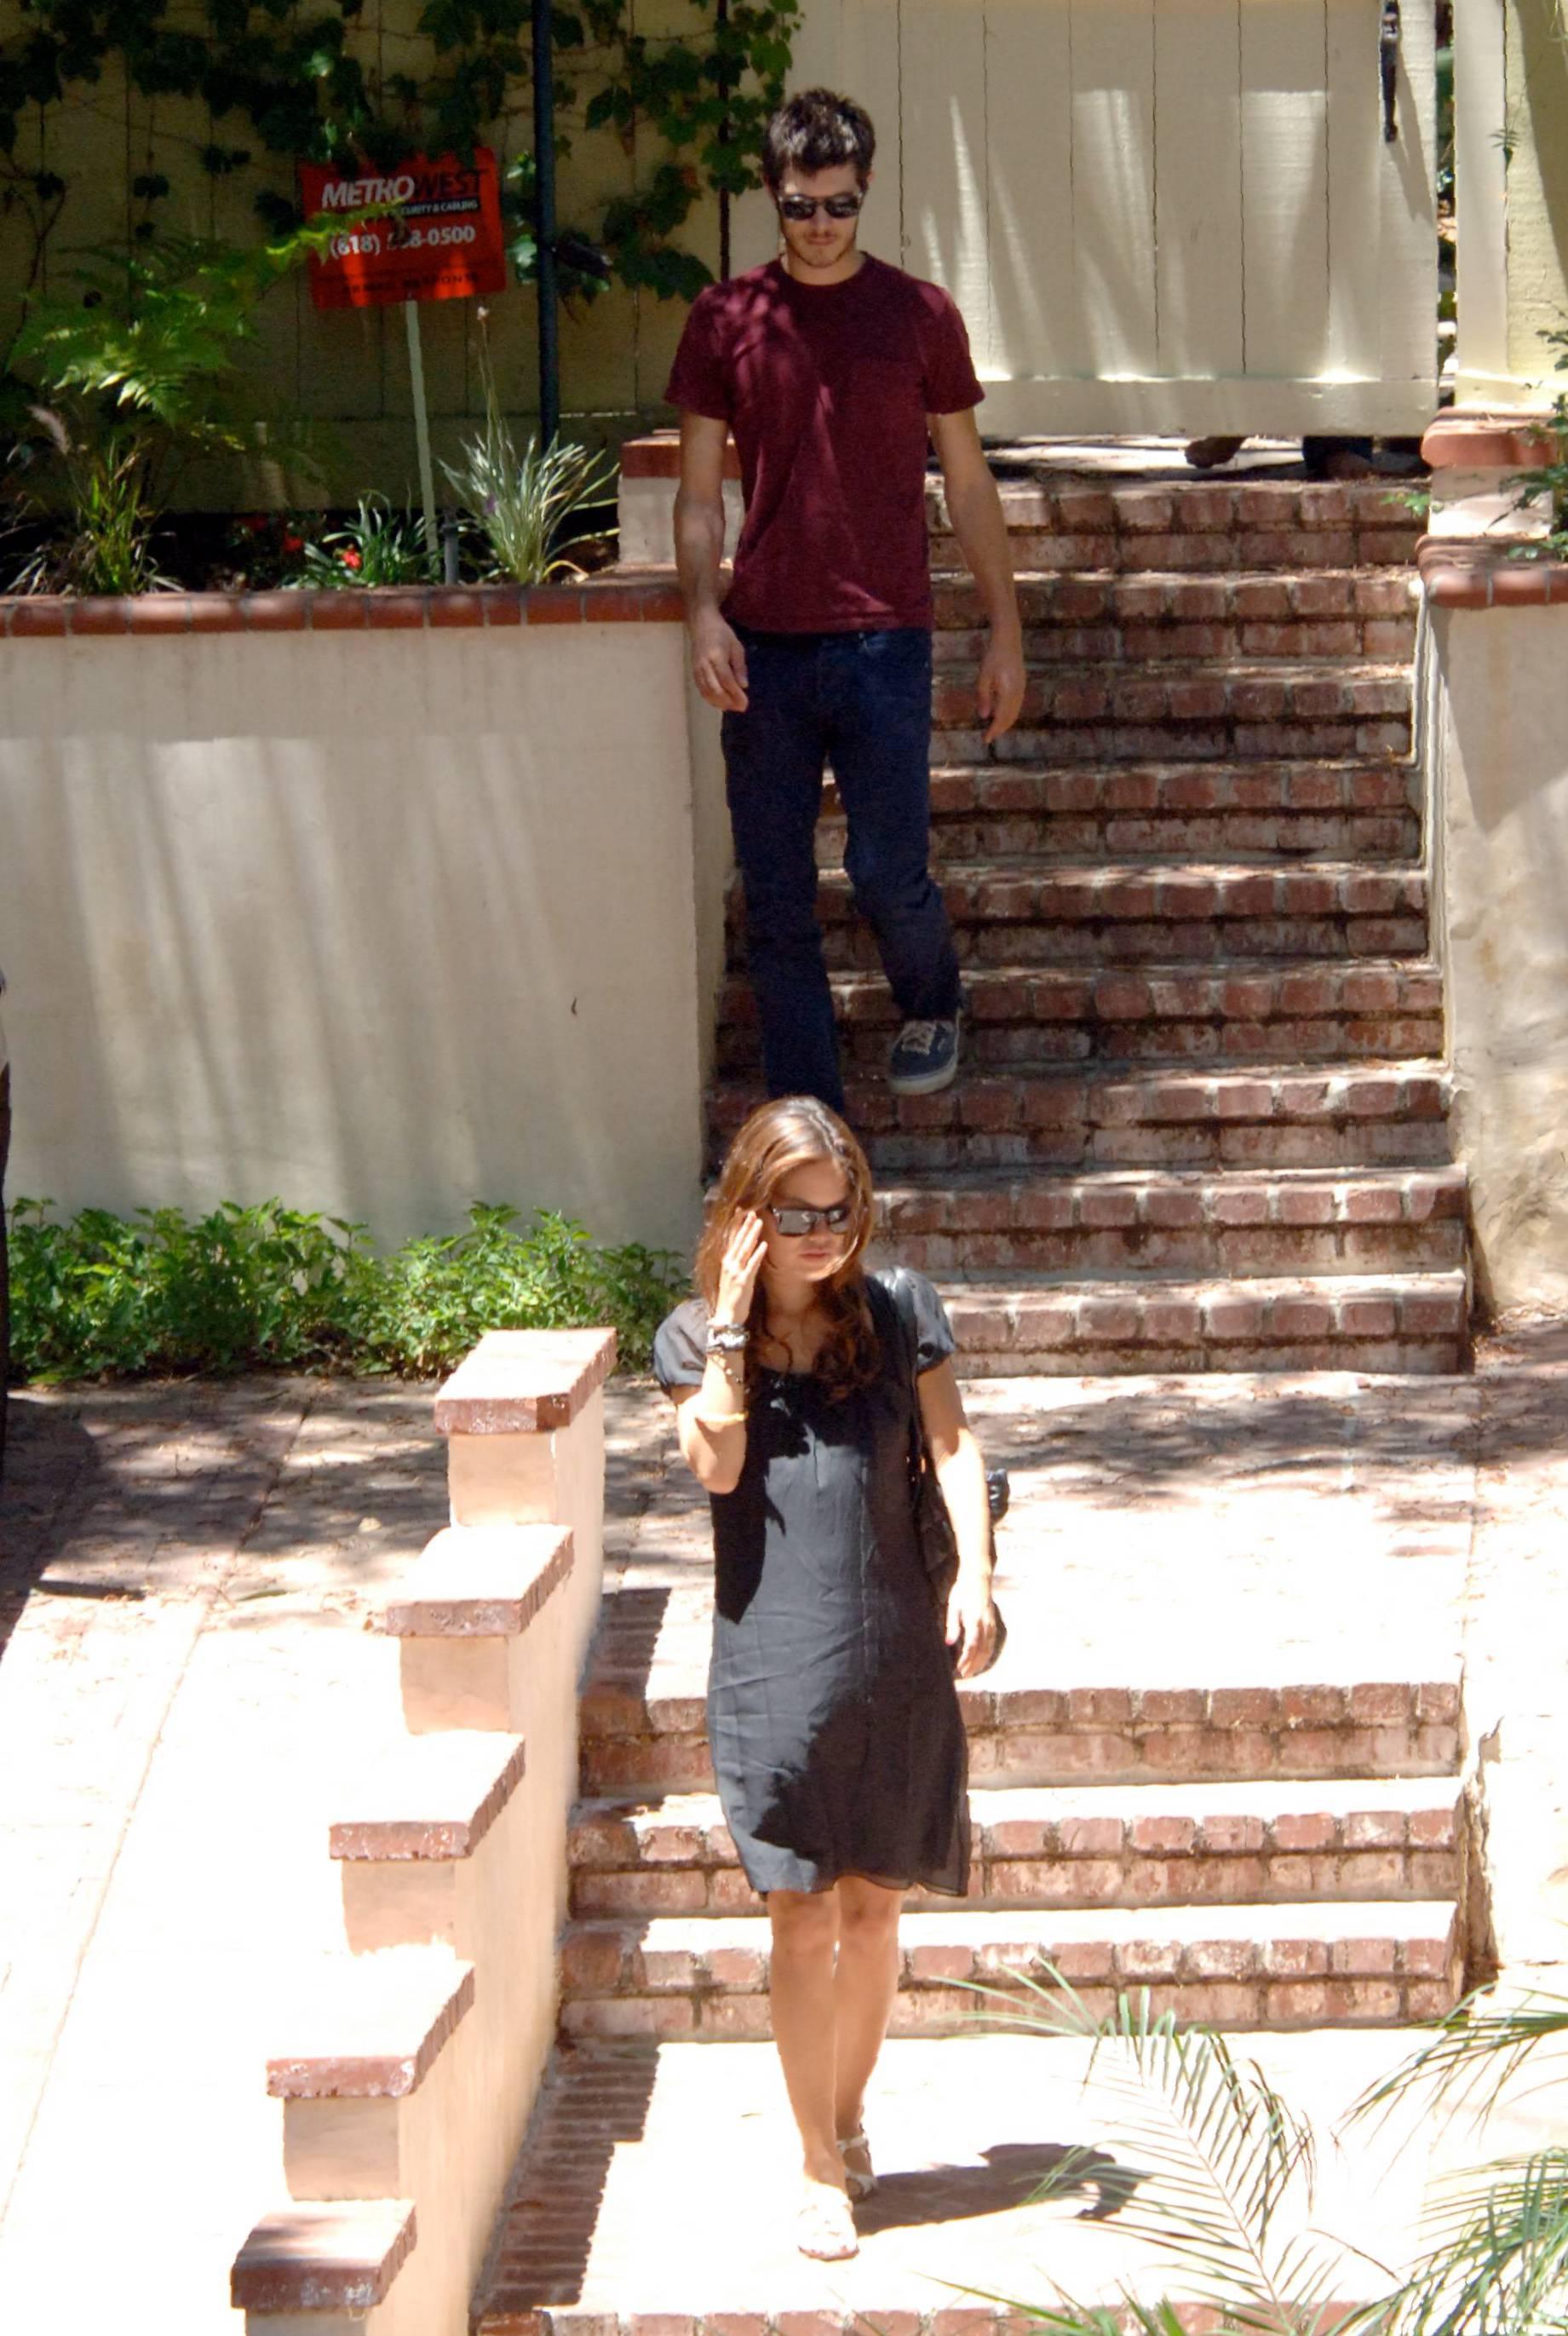 73167_Rachel_Bilson_with_her_sister_in_Hollywood_04_309lo.jpg